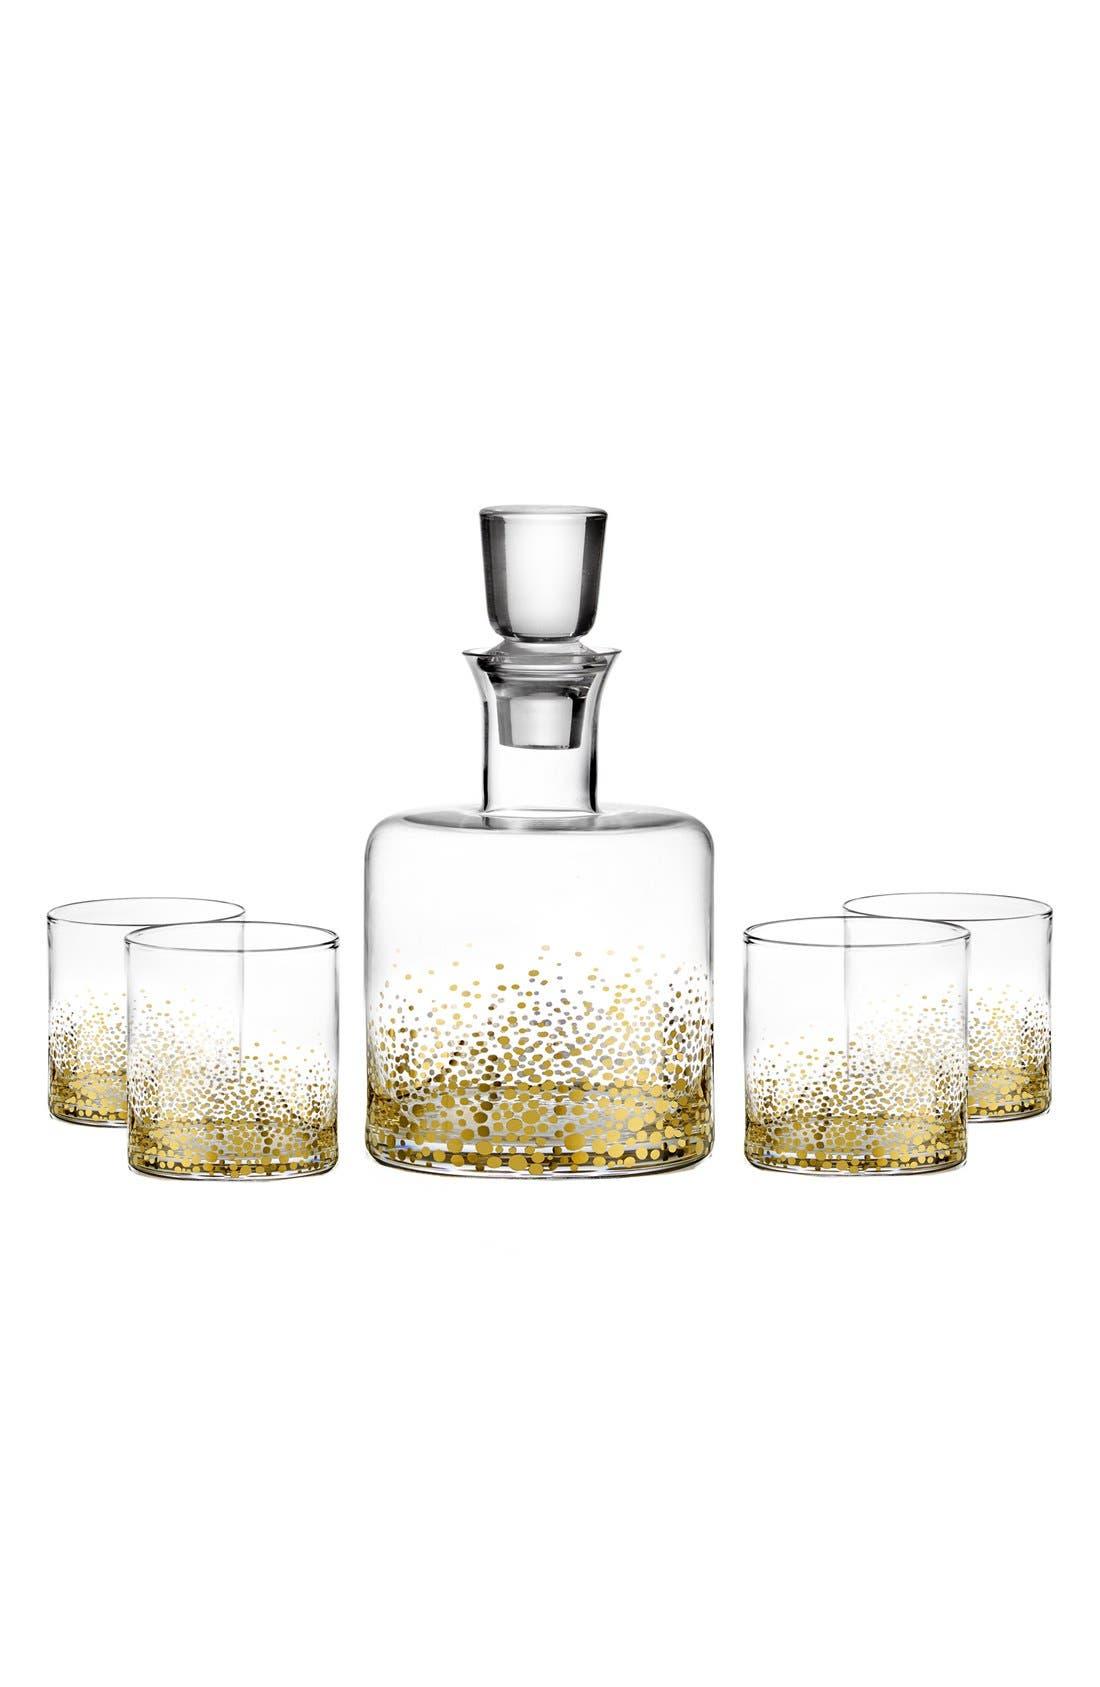 'Daphne' Decanter & Whiskey Glasses,                         Main,                         color, Luster/ Light Gold